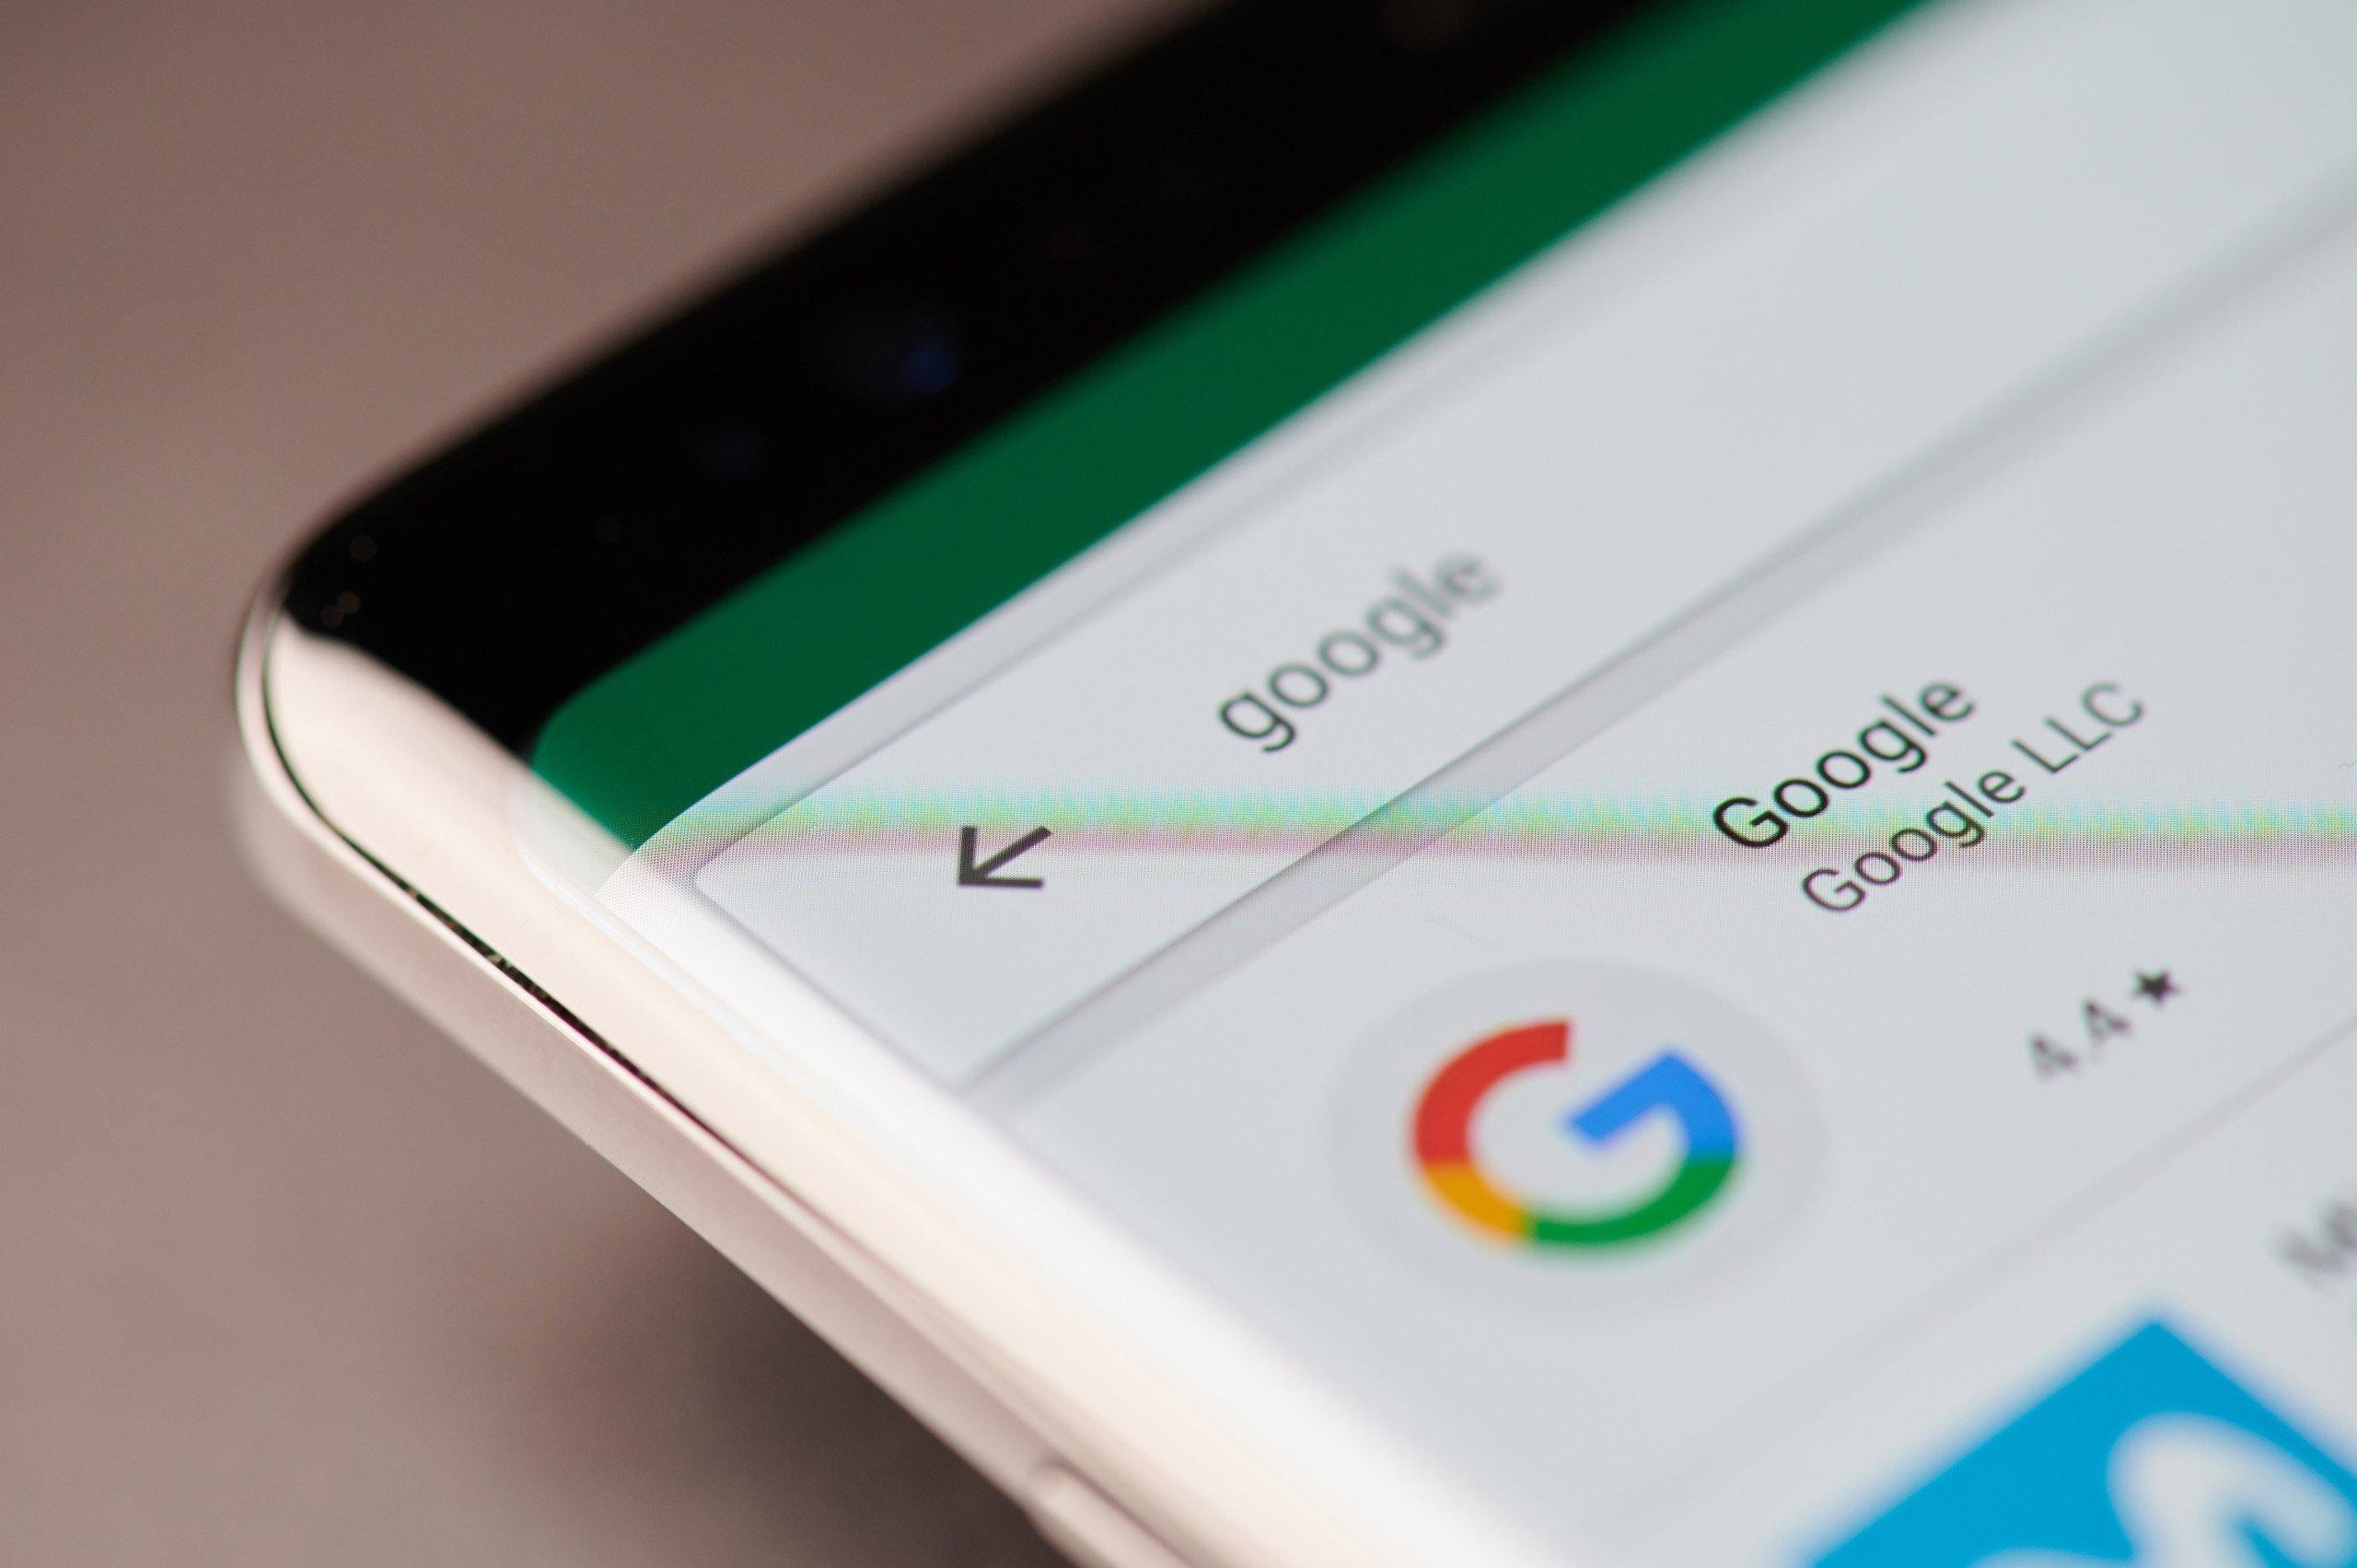 seo content syndication google rankings